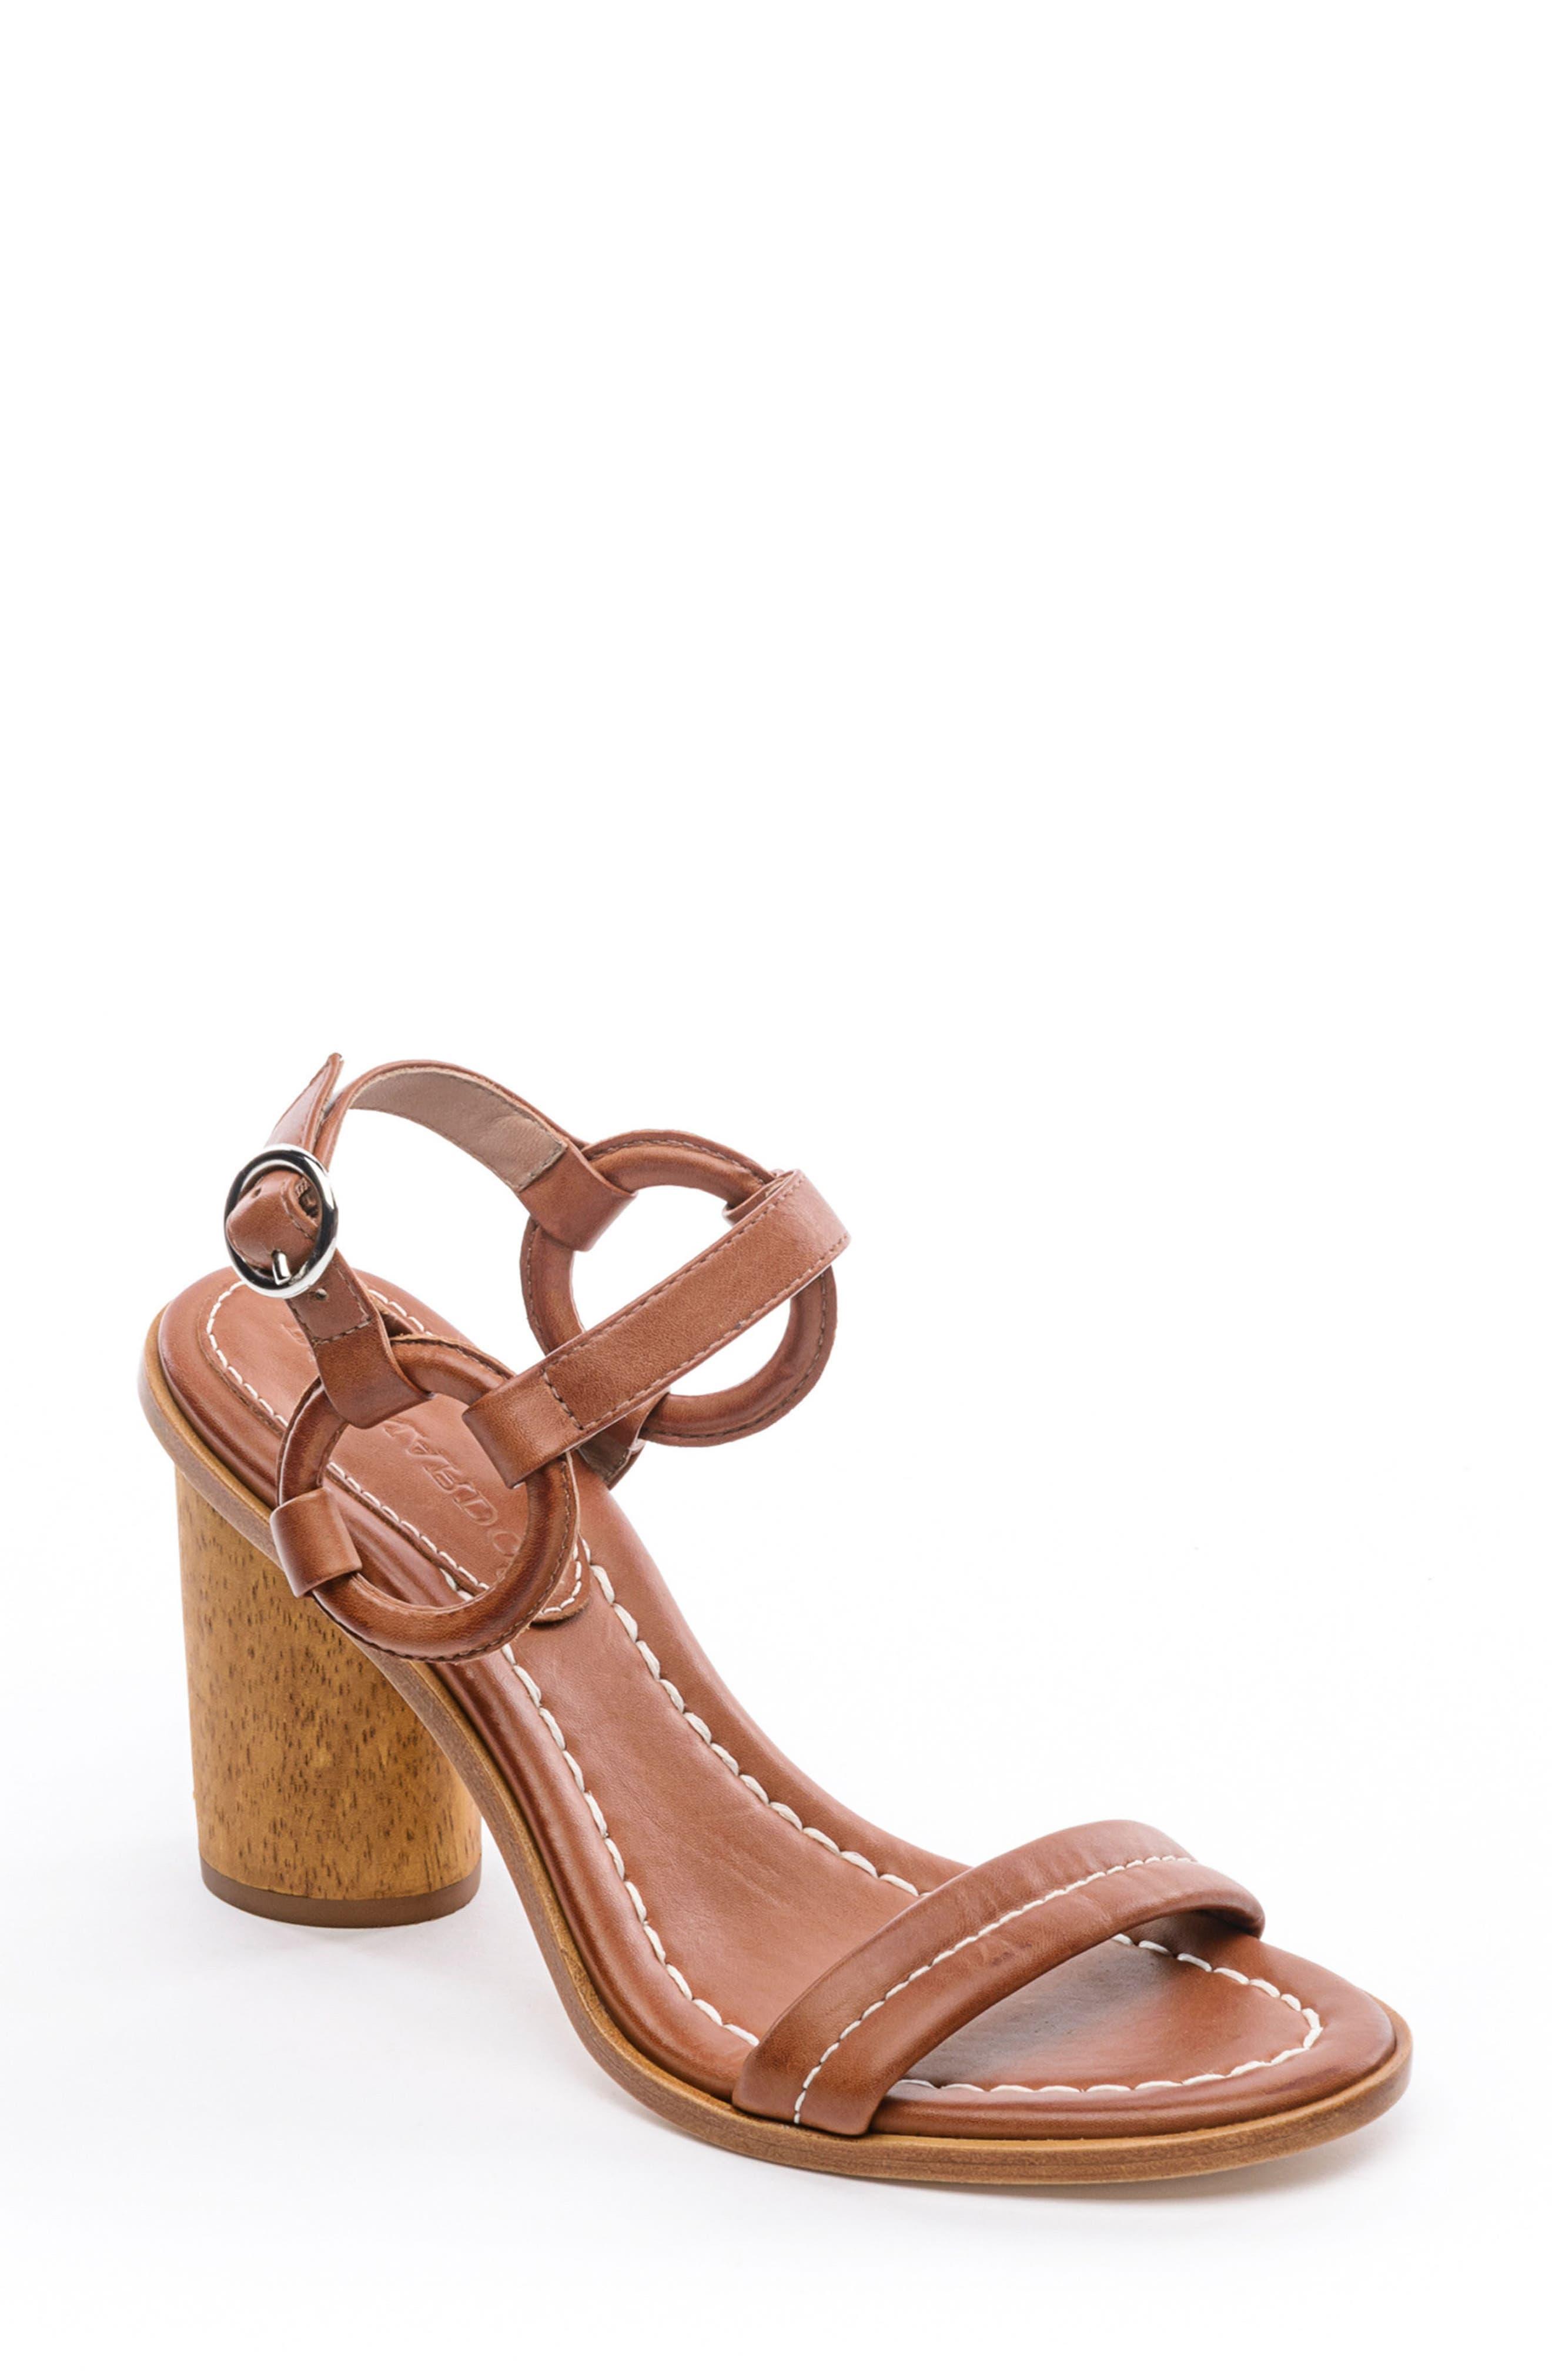 0c7beb63642 bernardo sandals